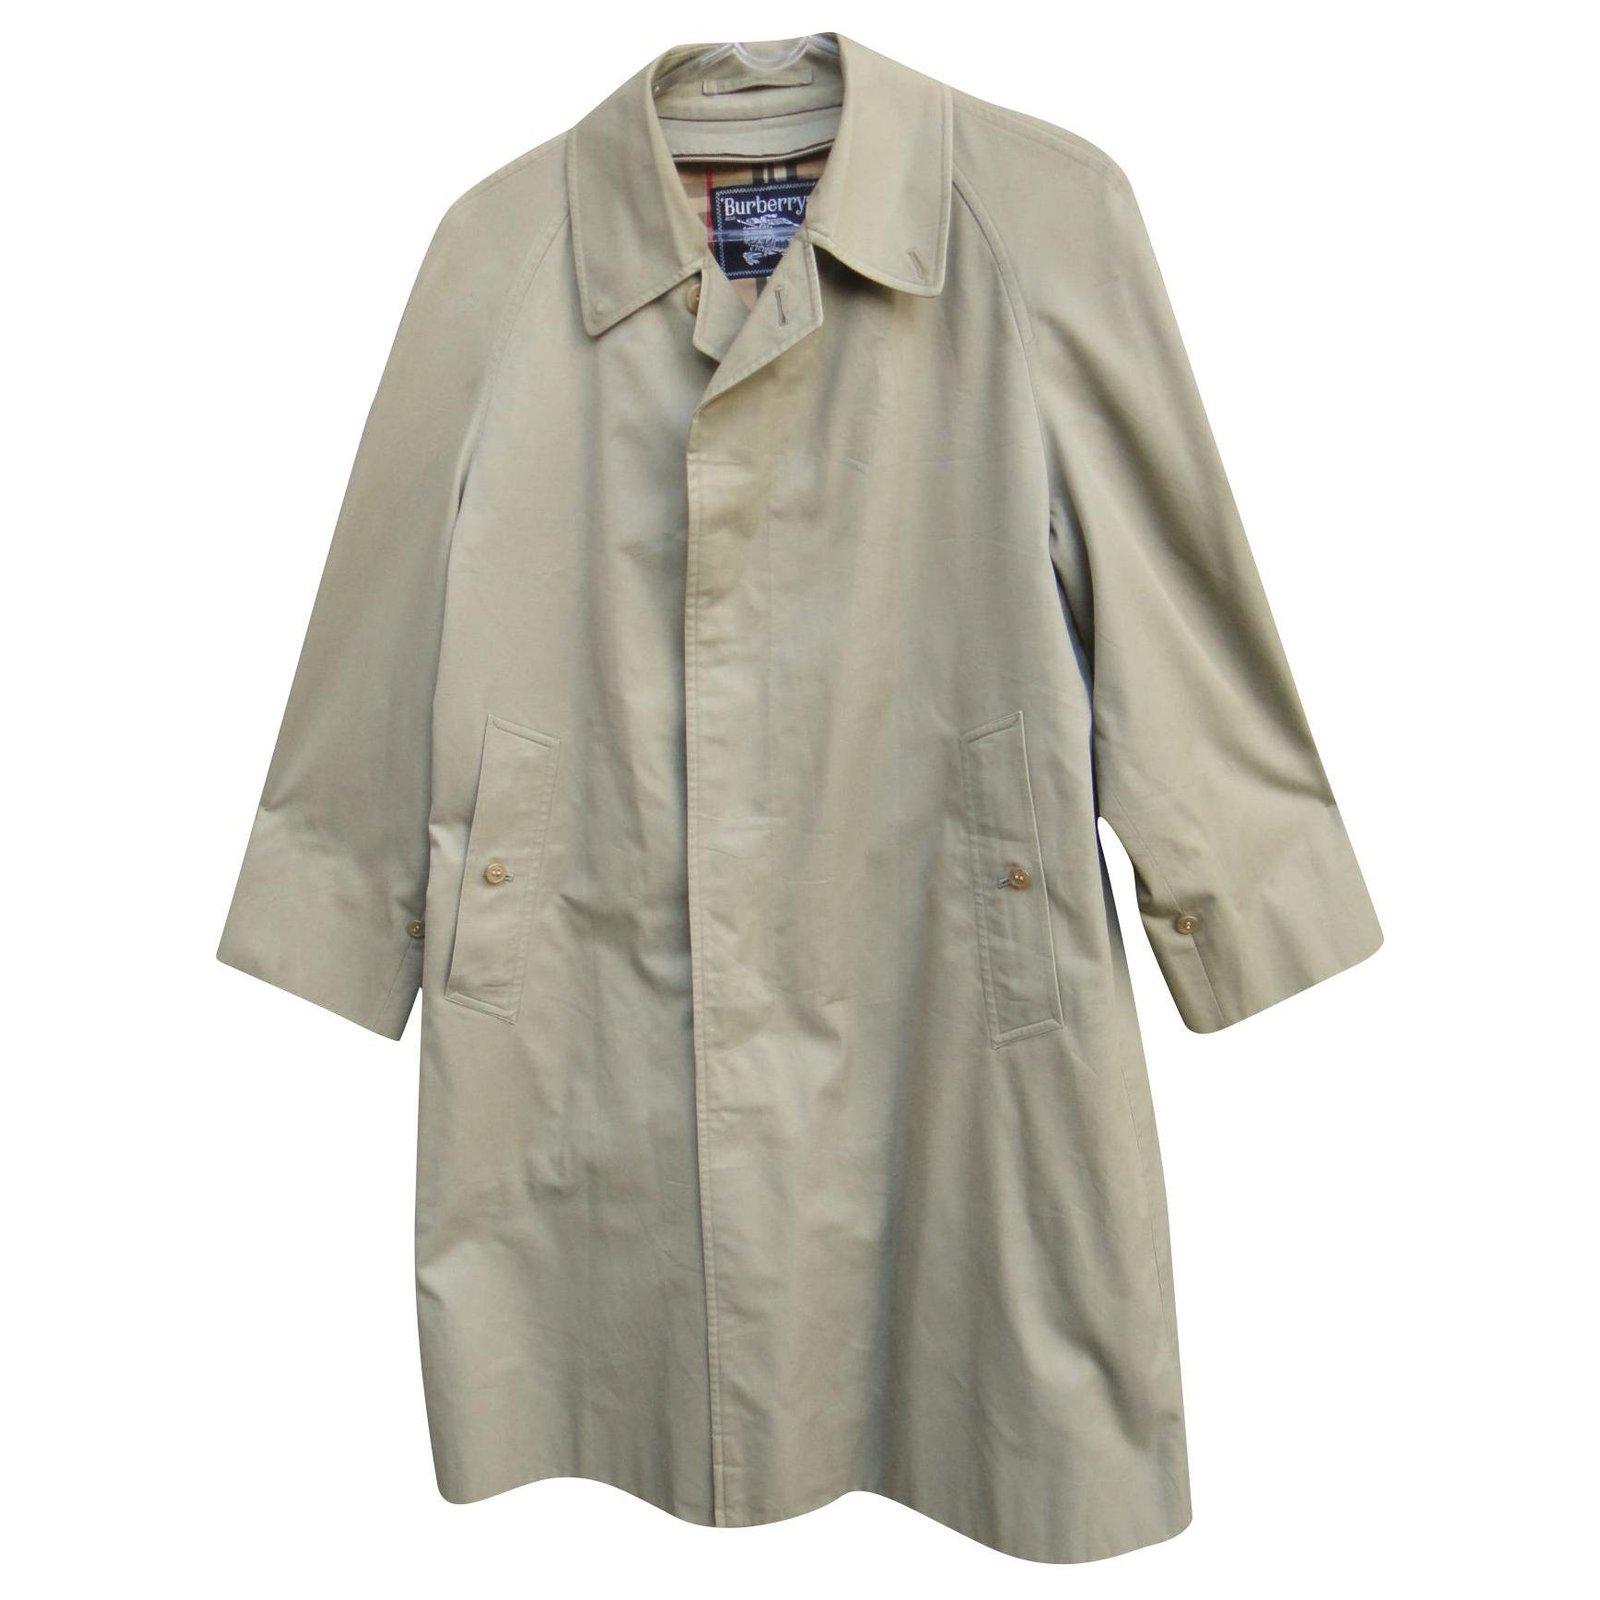 manteaux homme taille xs